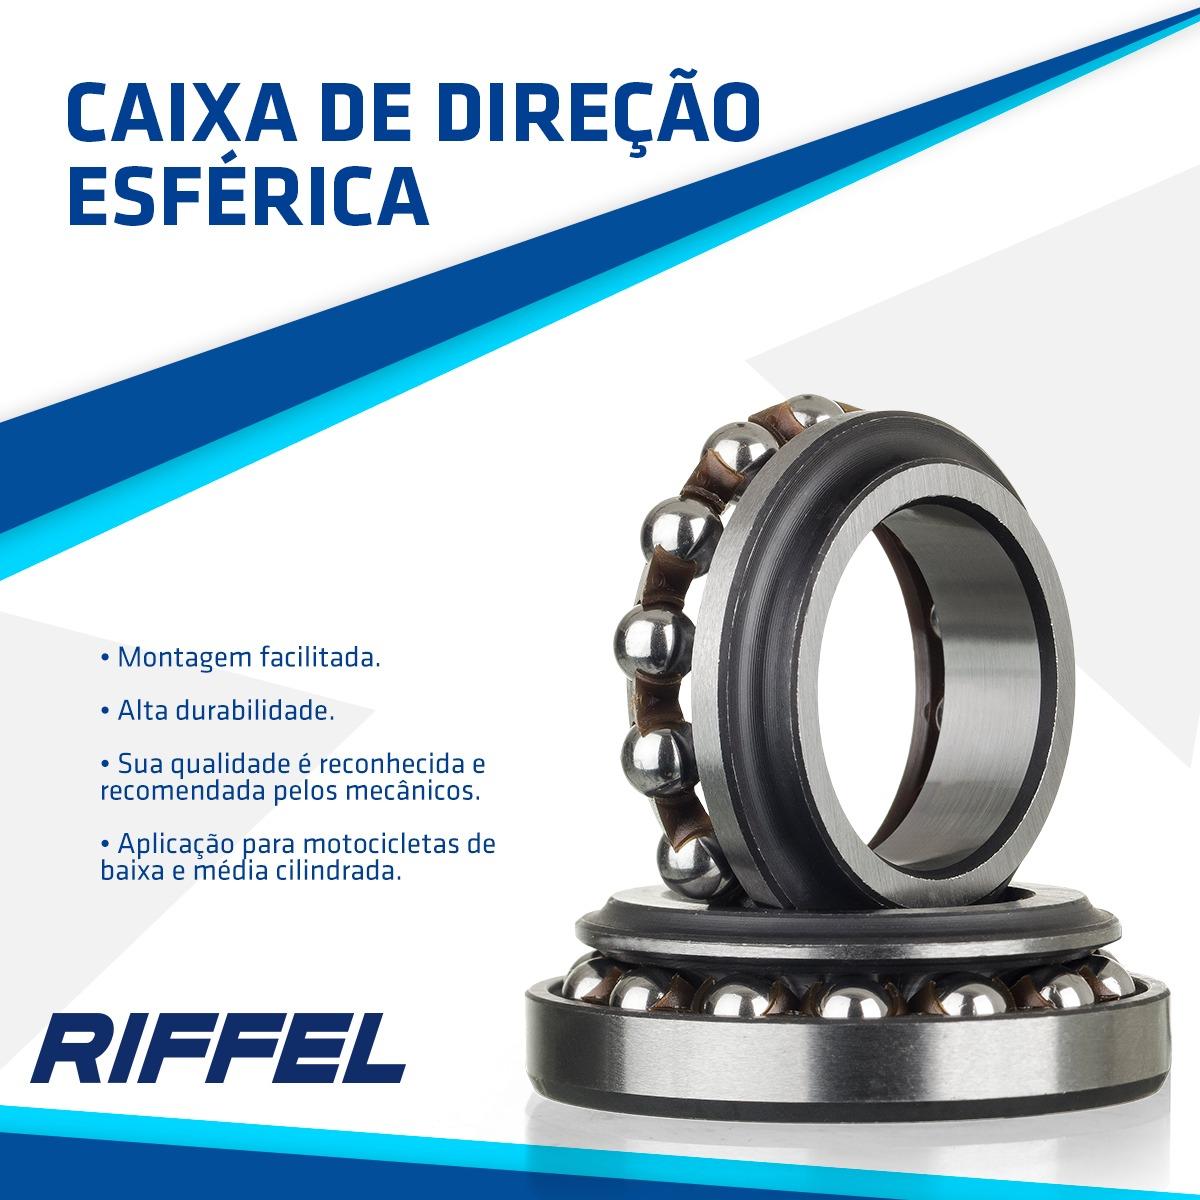 Caixa de Direção Esférica NXR 125-150-160 BROS / NXR 150 BROS / XLR 125 / XR 200 / NX-4 Falcon / XR 250 / NX 200 / NX 15